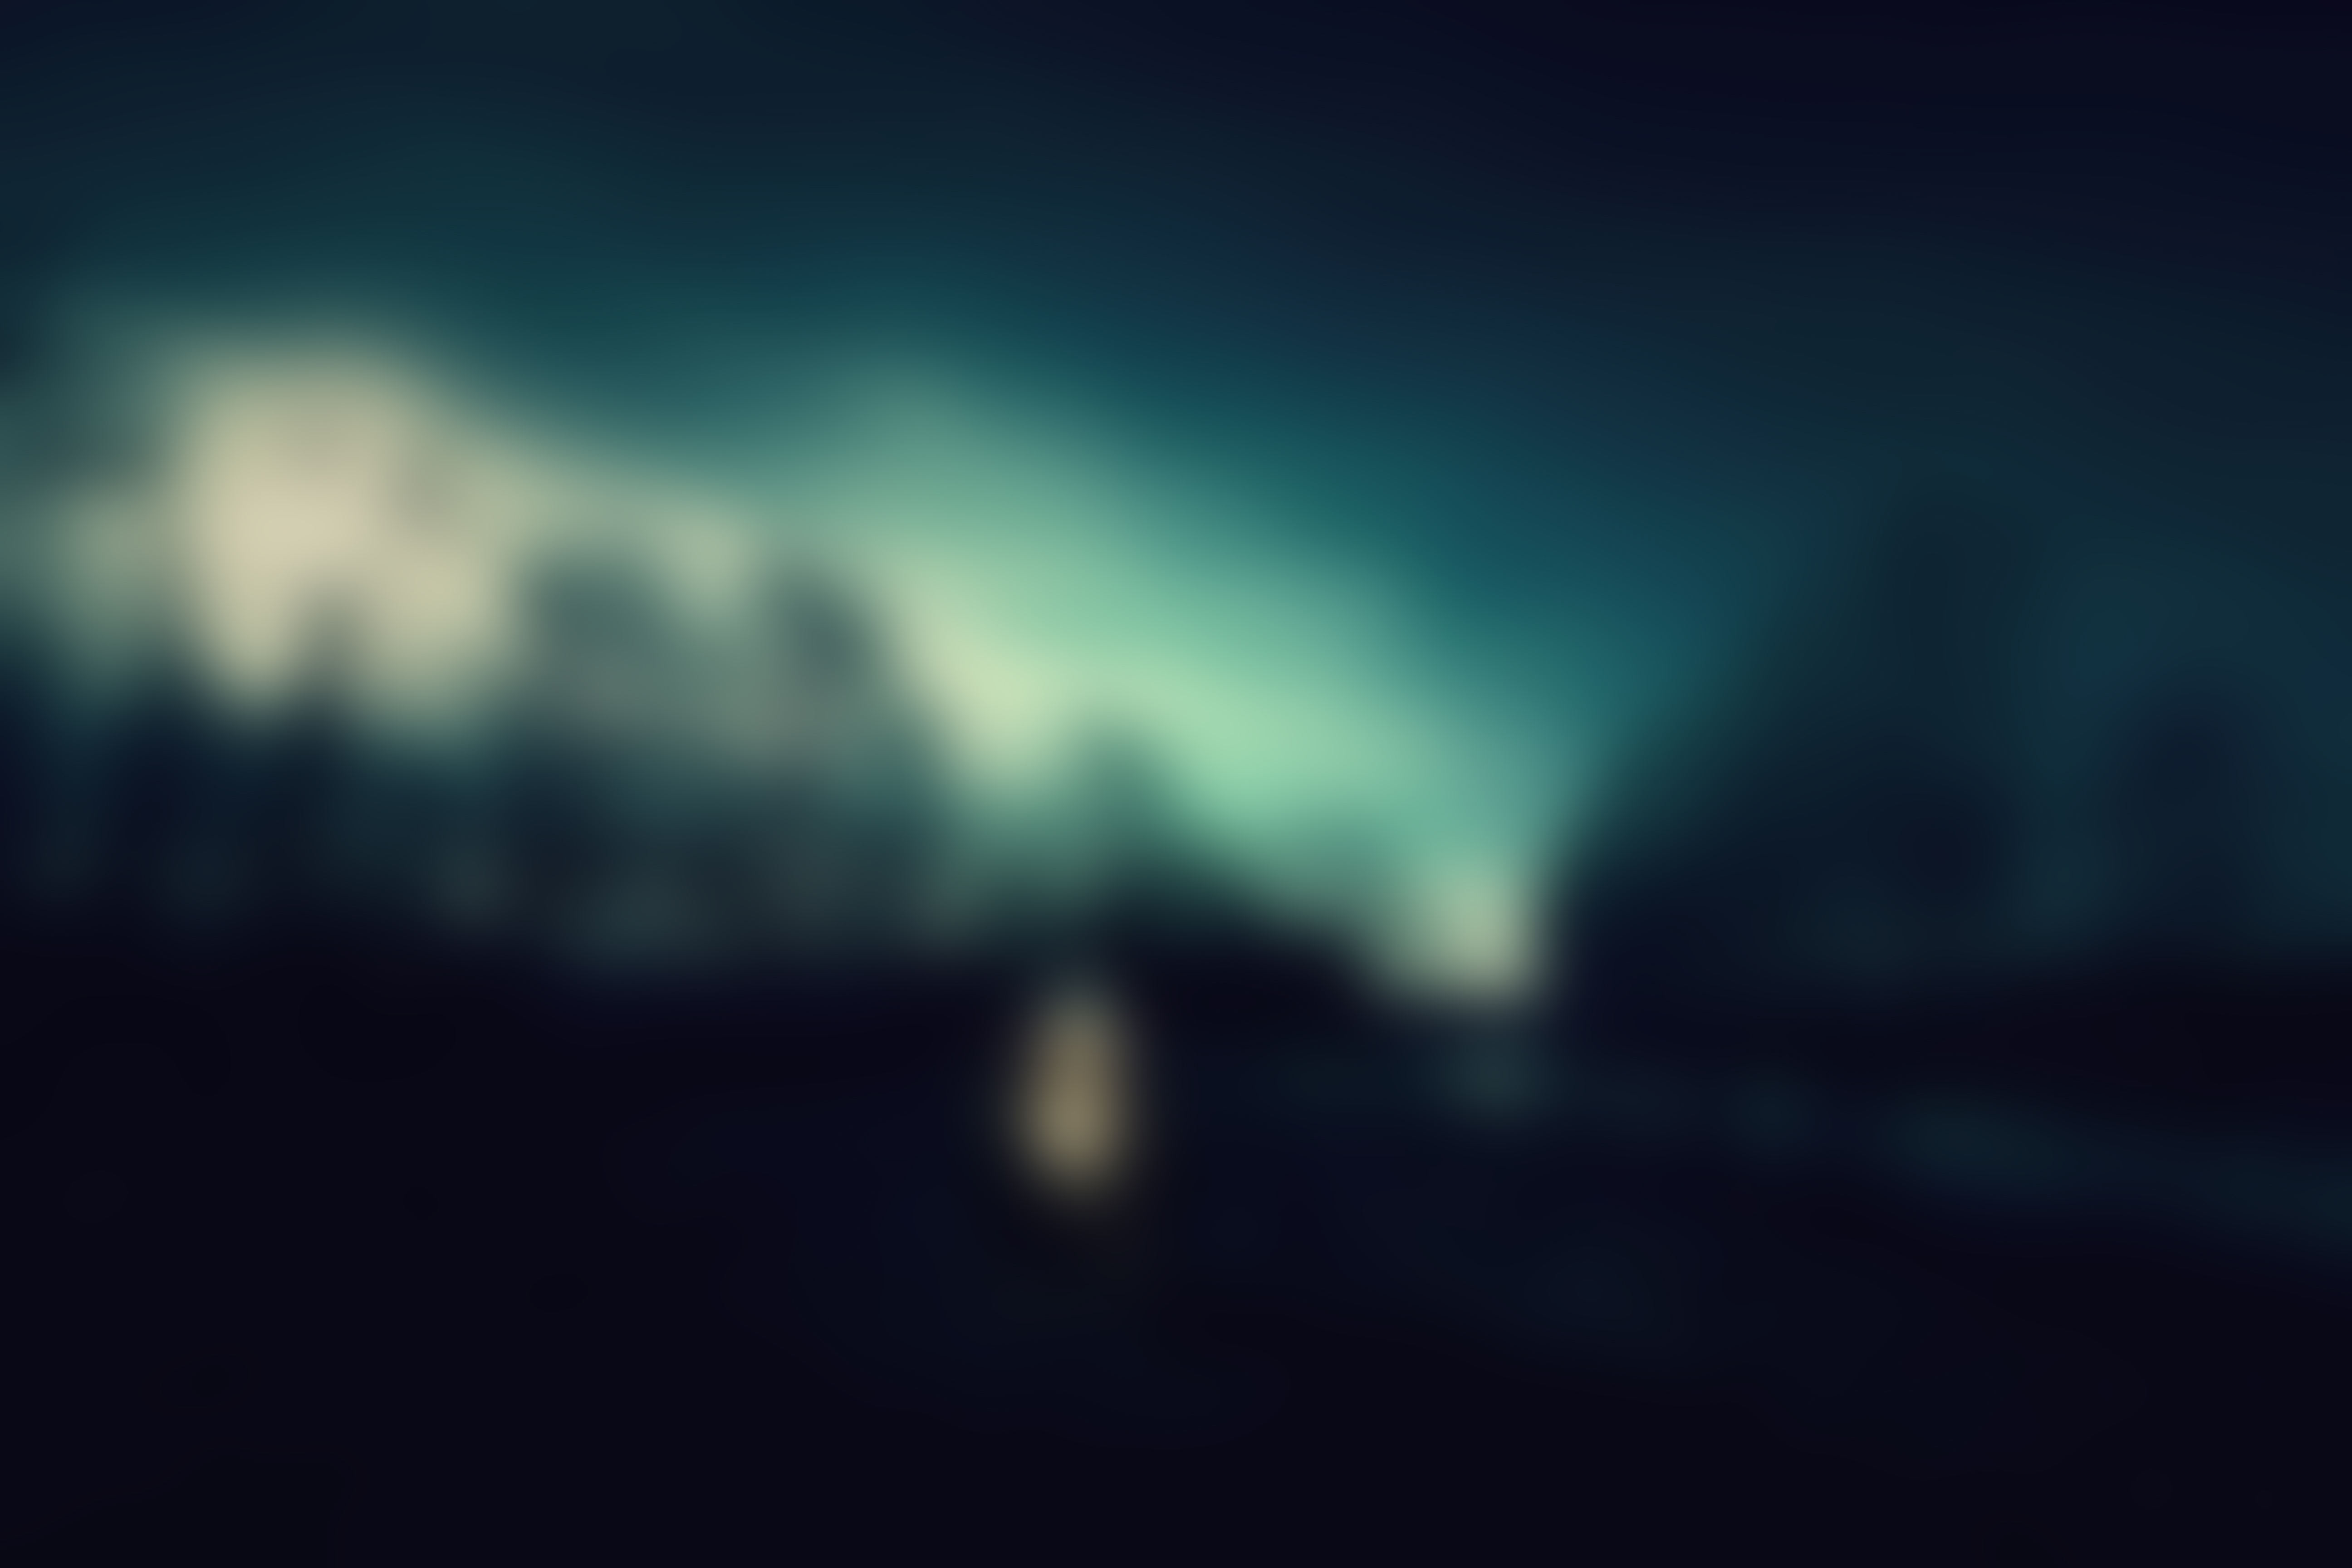 night-dark-blur-blurred